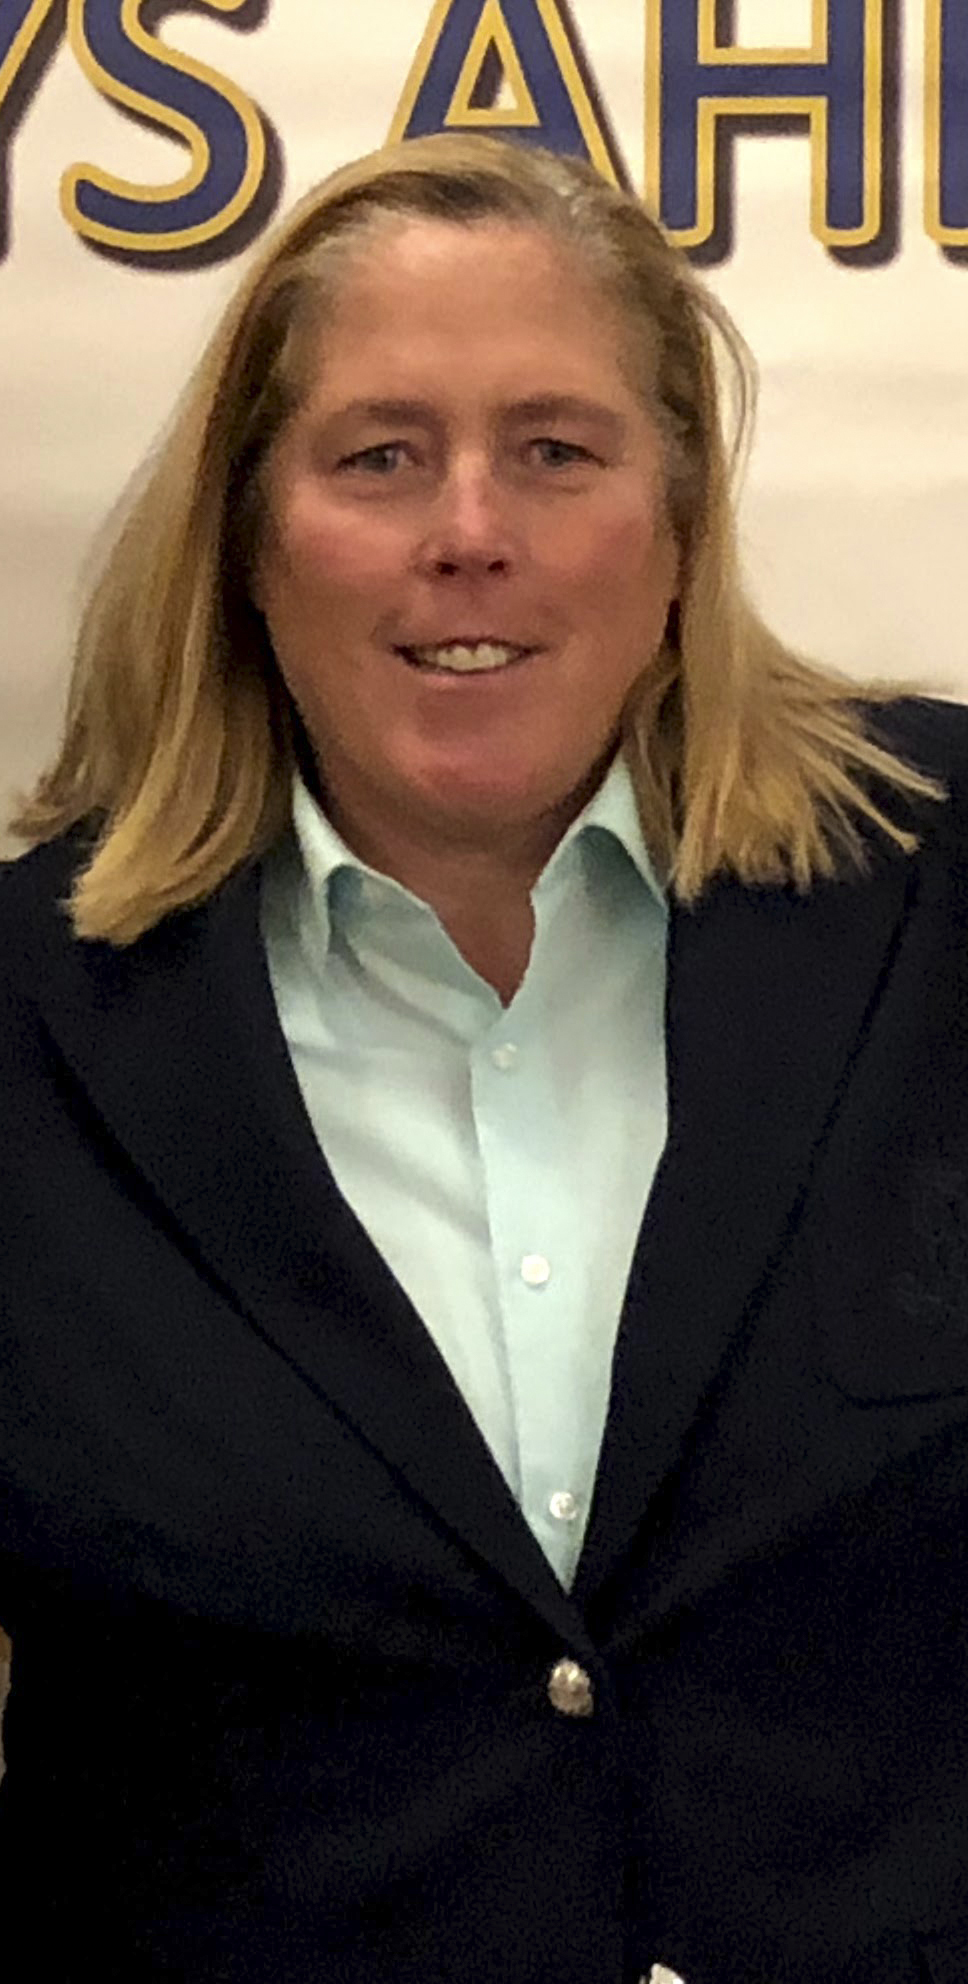 Westhampton Beach Athletic Director Kathy Masterson